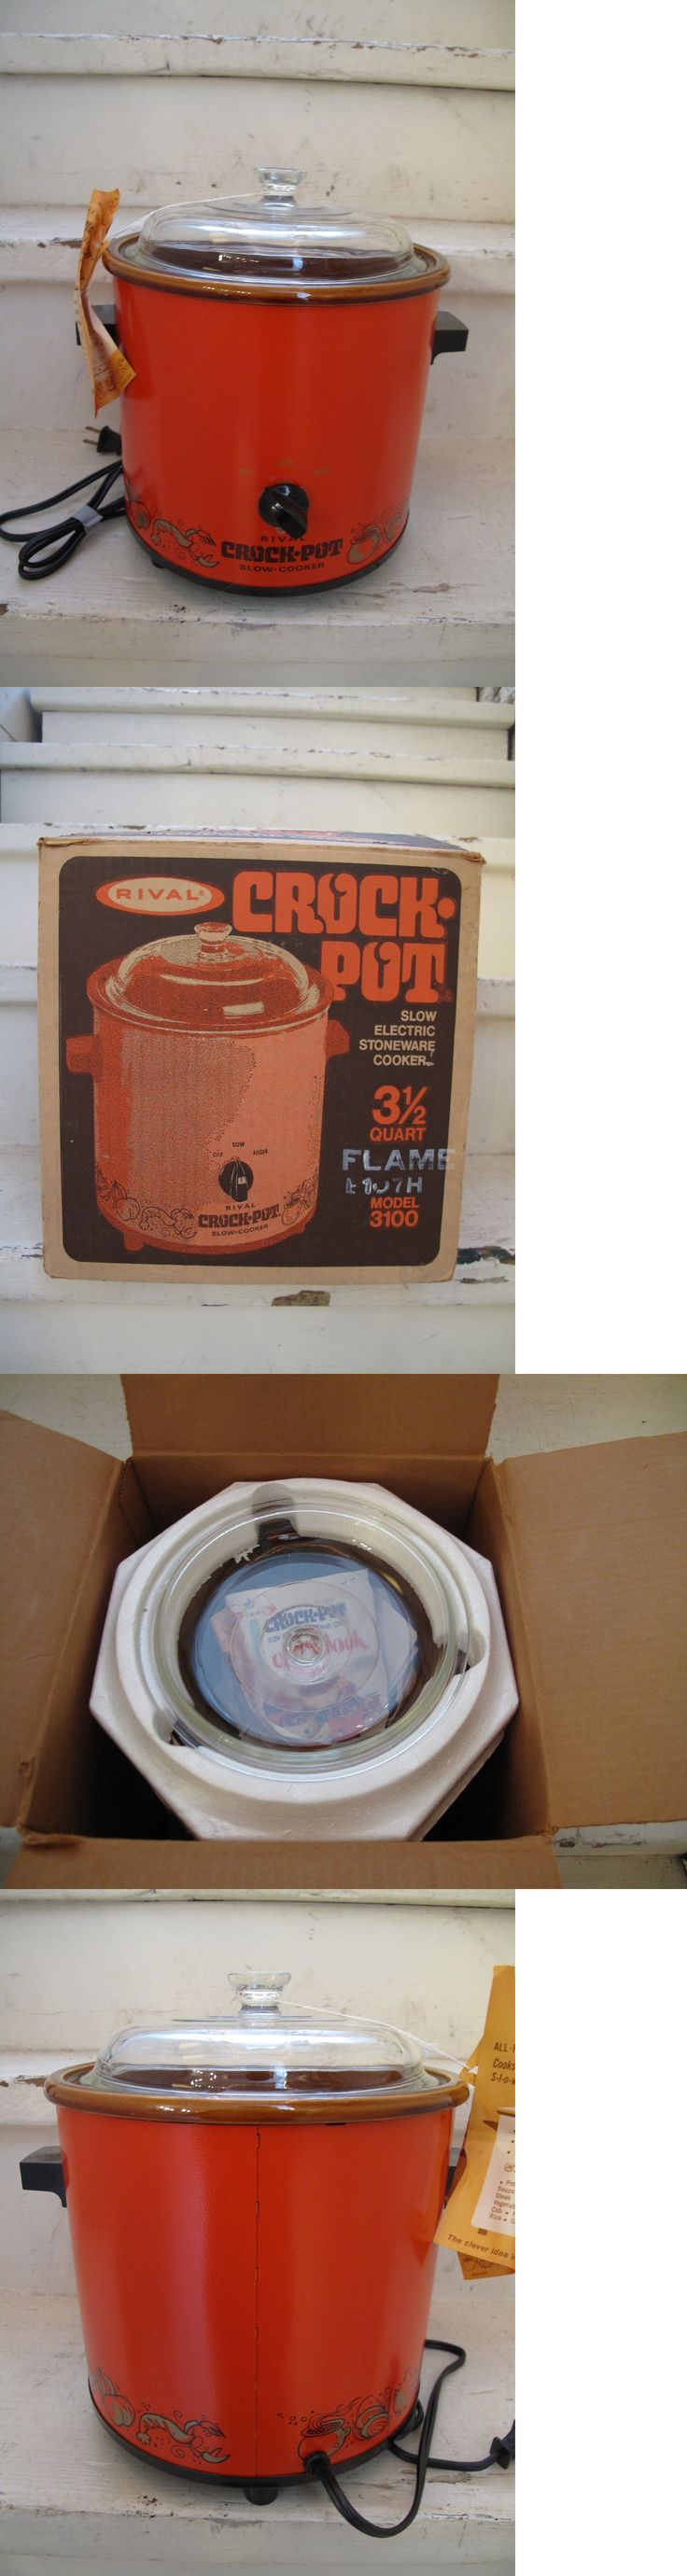 Vintage Small Appliances 116013: Nos Nib Vintage Rival Crock Pot 3100 Flame Orange 3.5 Qt Slow Cooker Glass Lid -> BUY IT NOW ONLY: $34.99 on eBay!